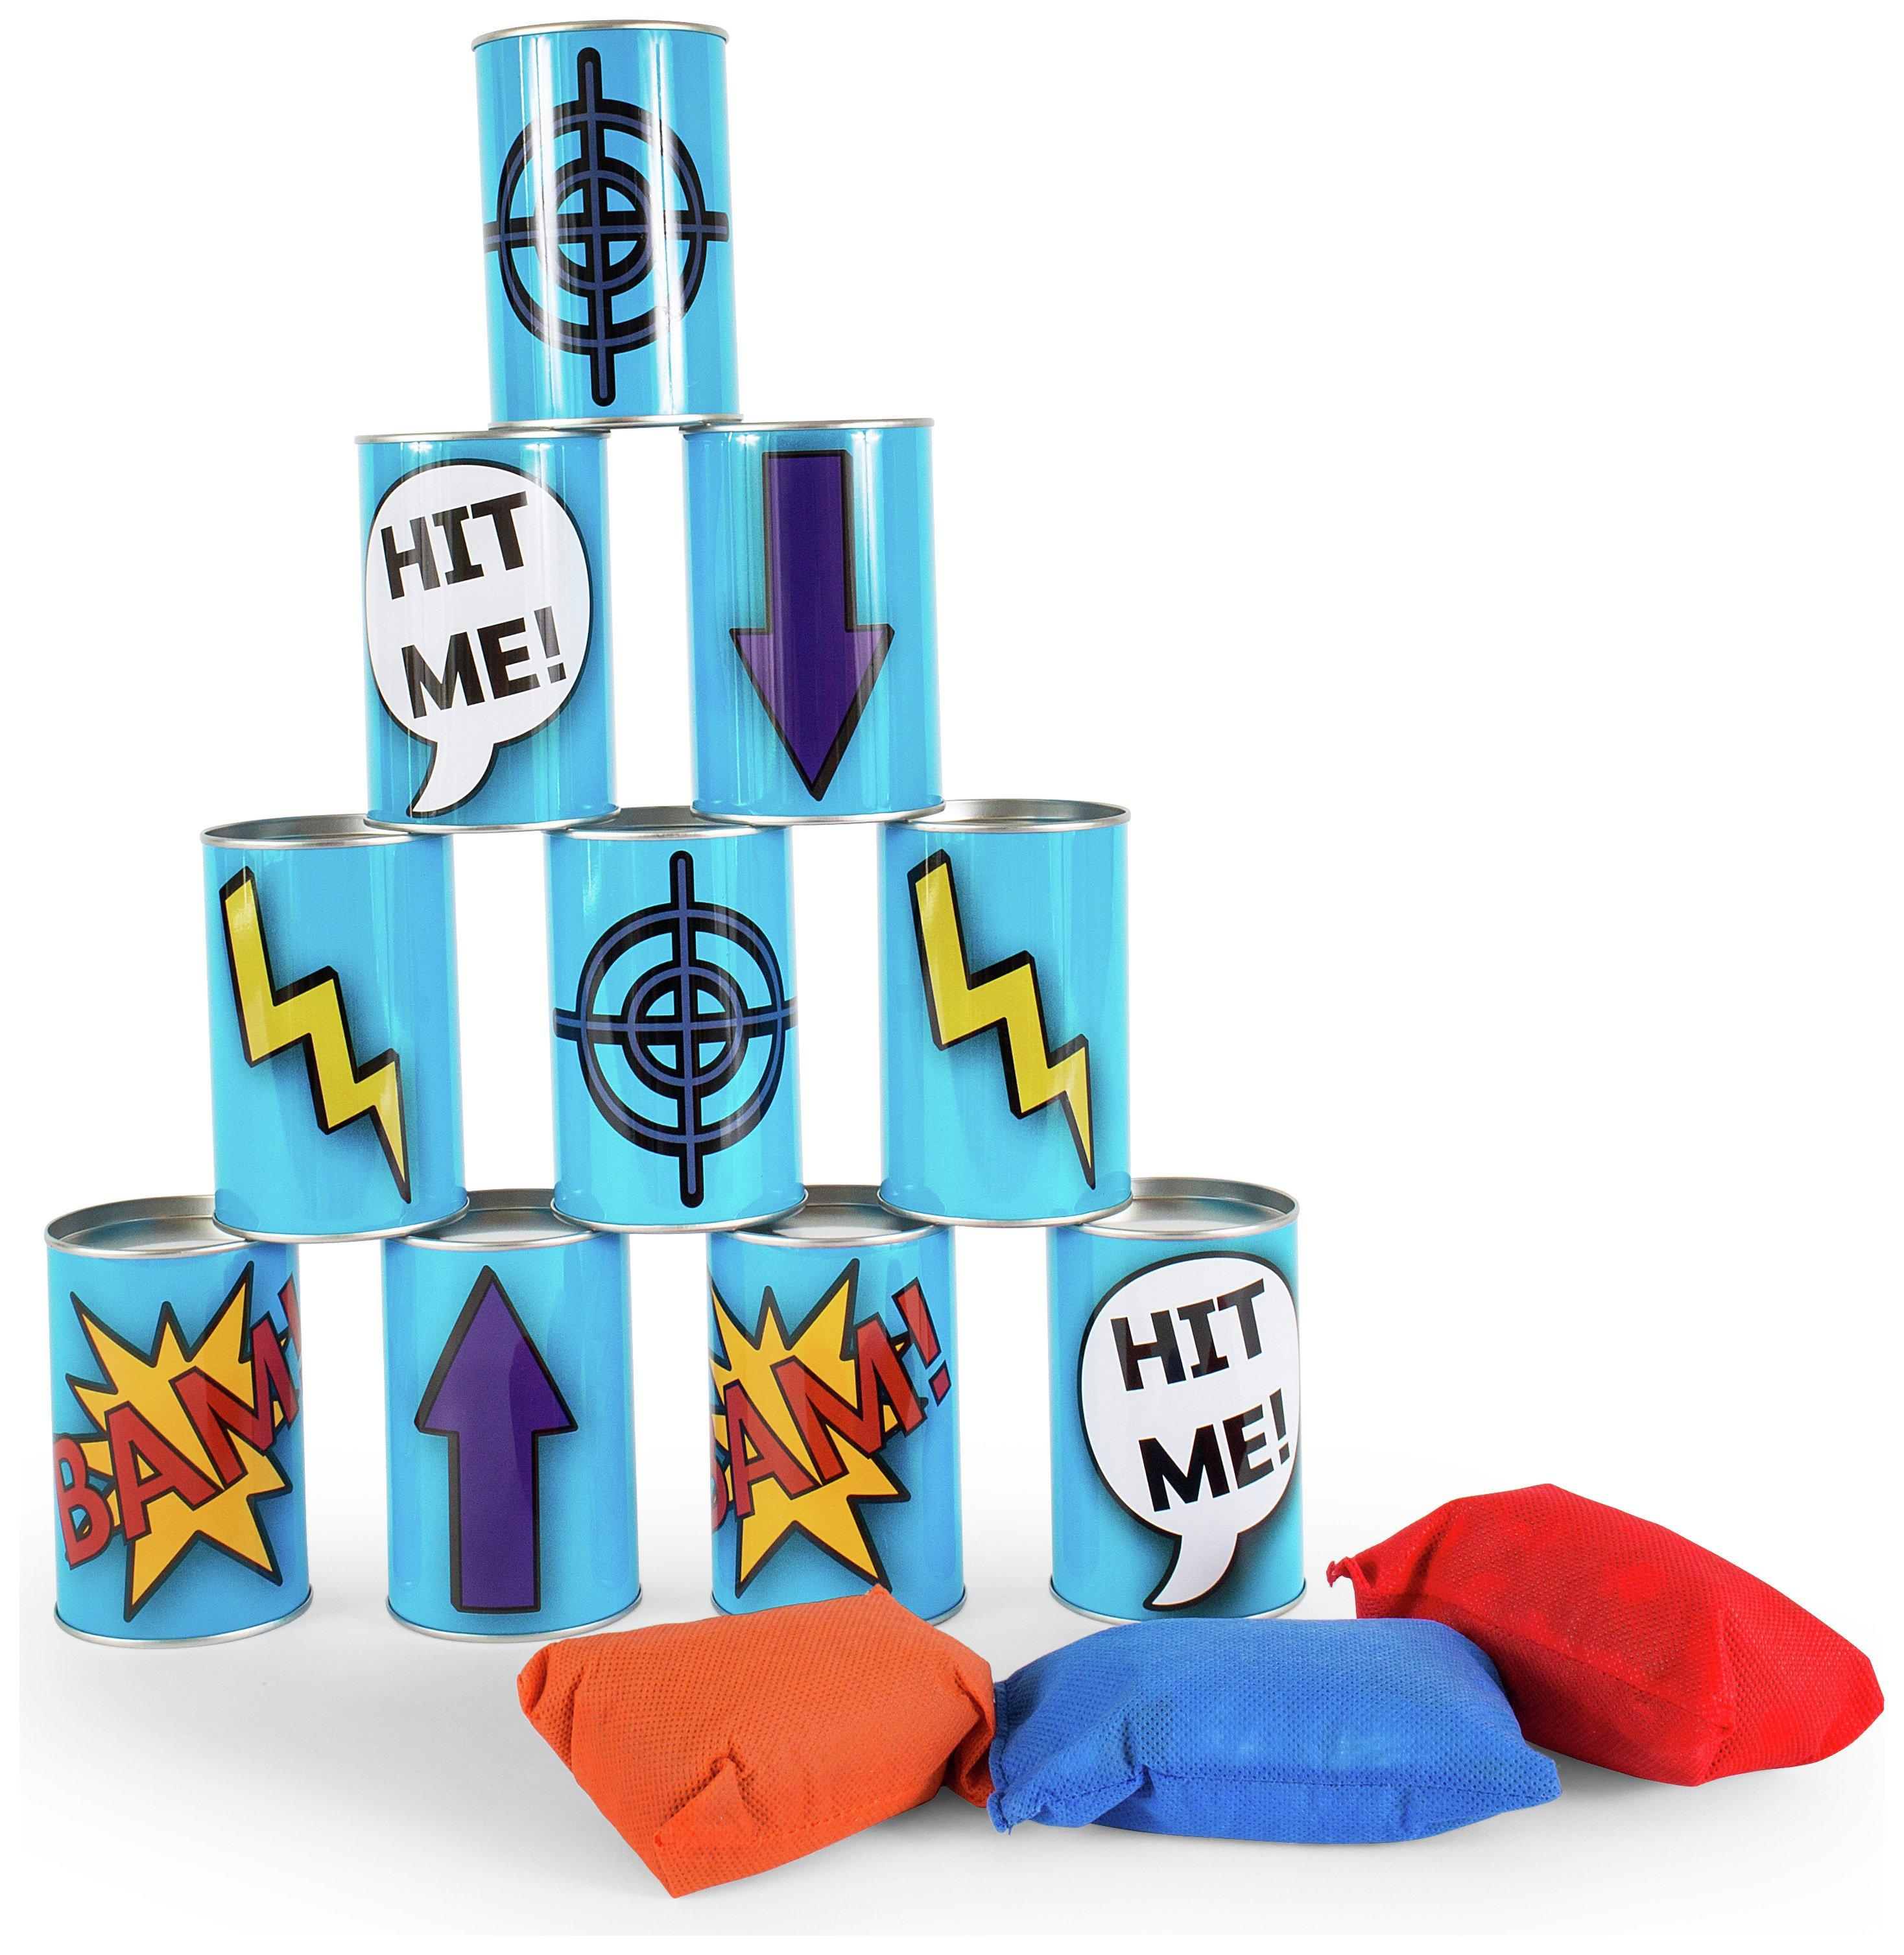 Image of Robbie Toys Buitenspeel Tin Throwing Game.